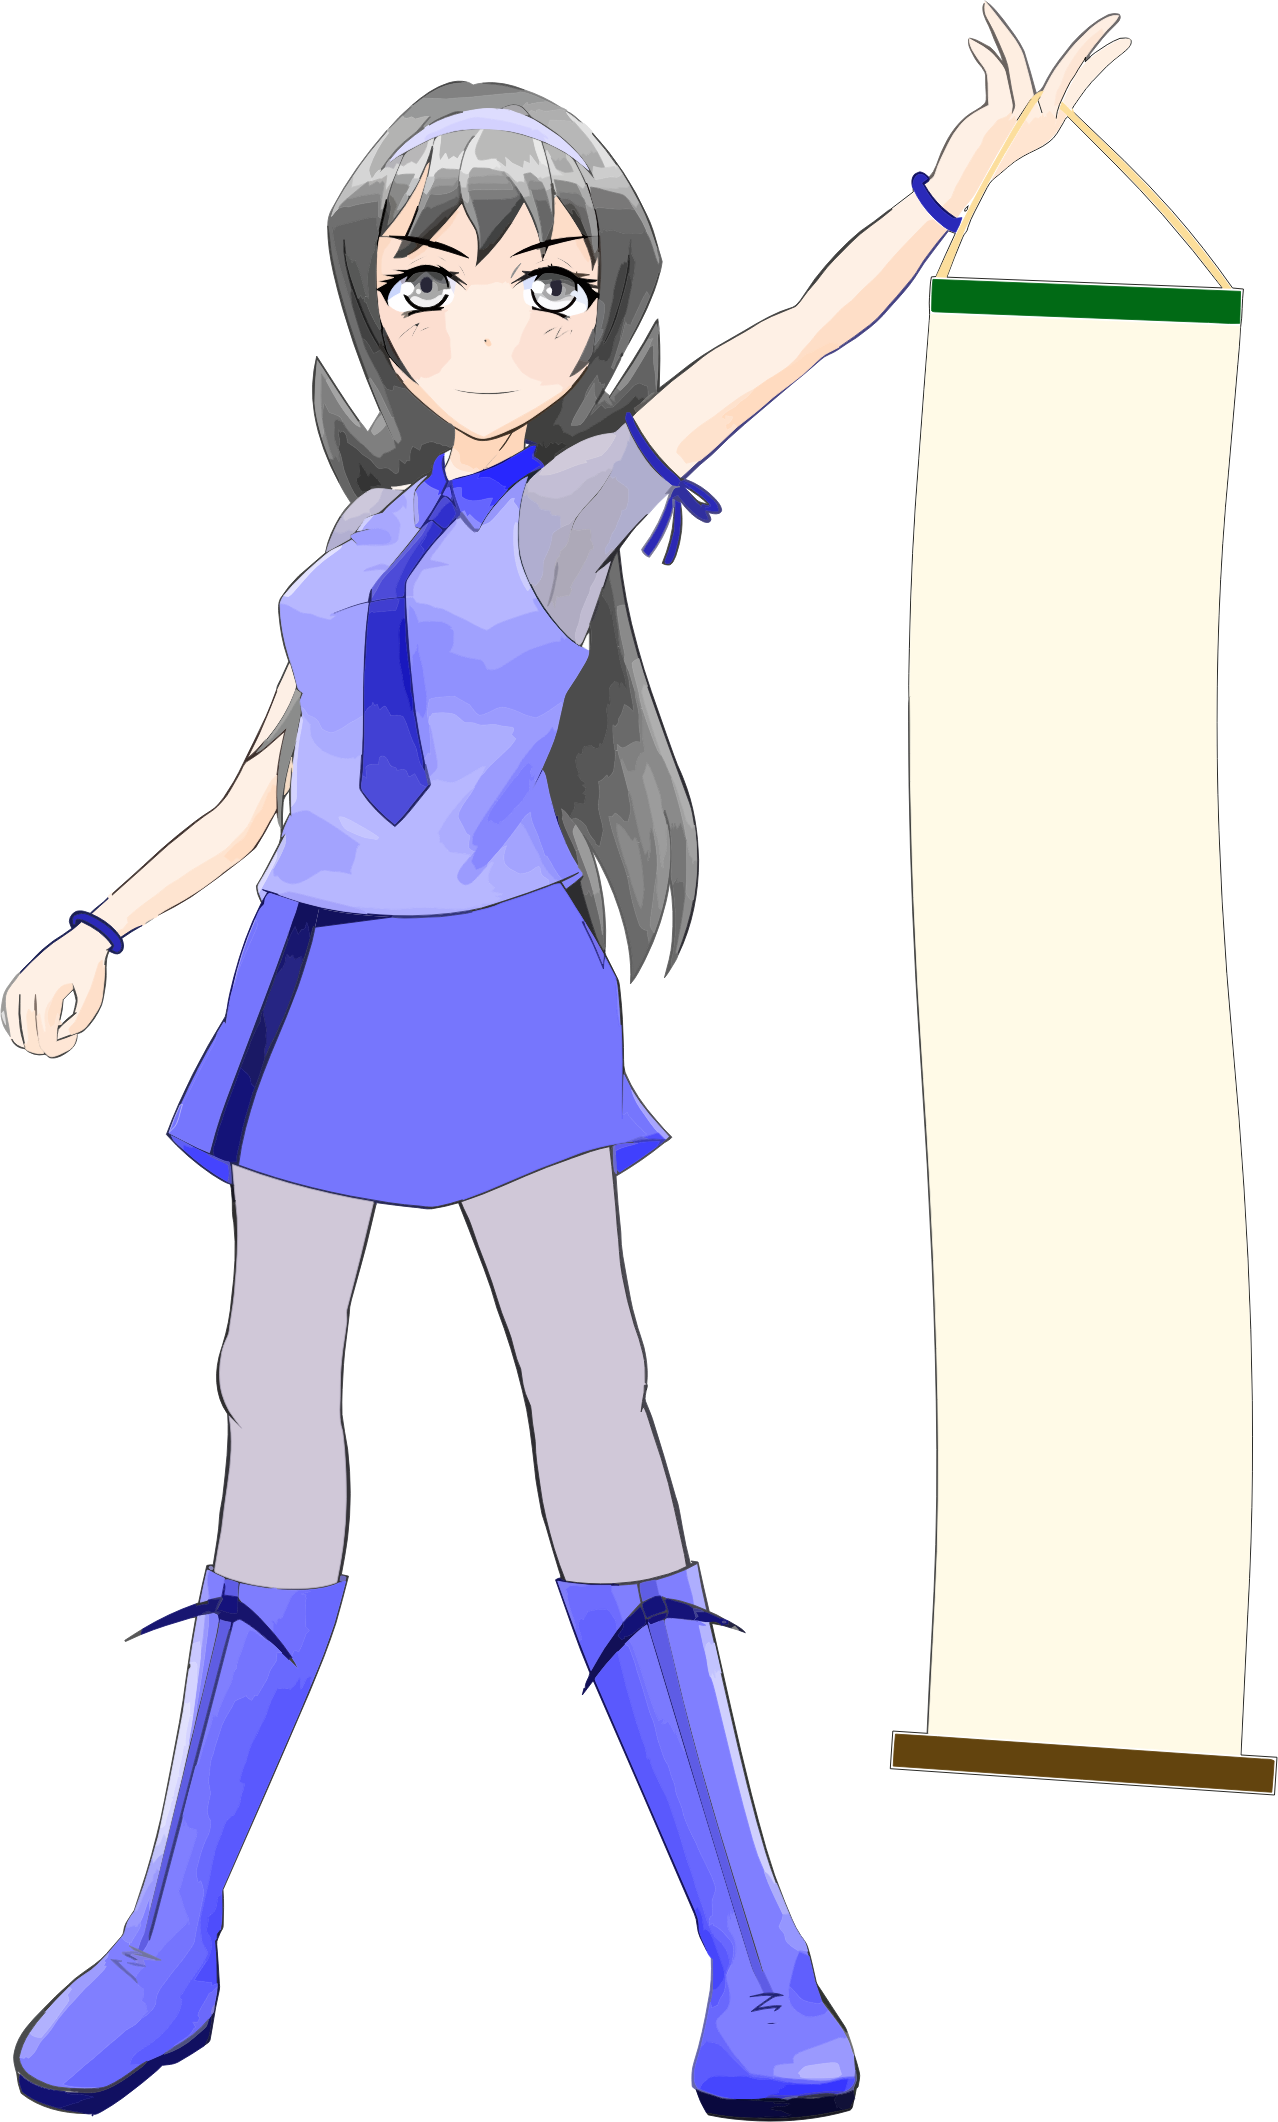 Anime clipart clip art. Girl cola mateya big